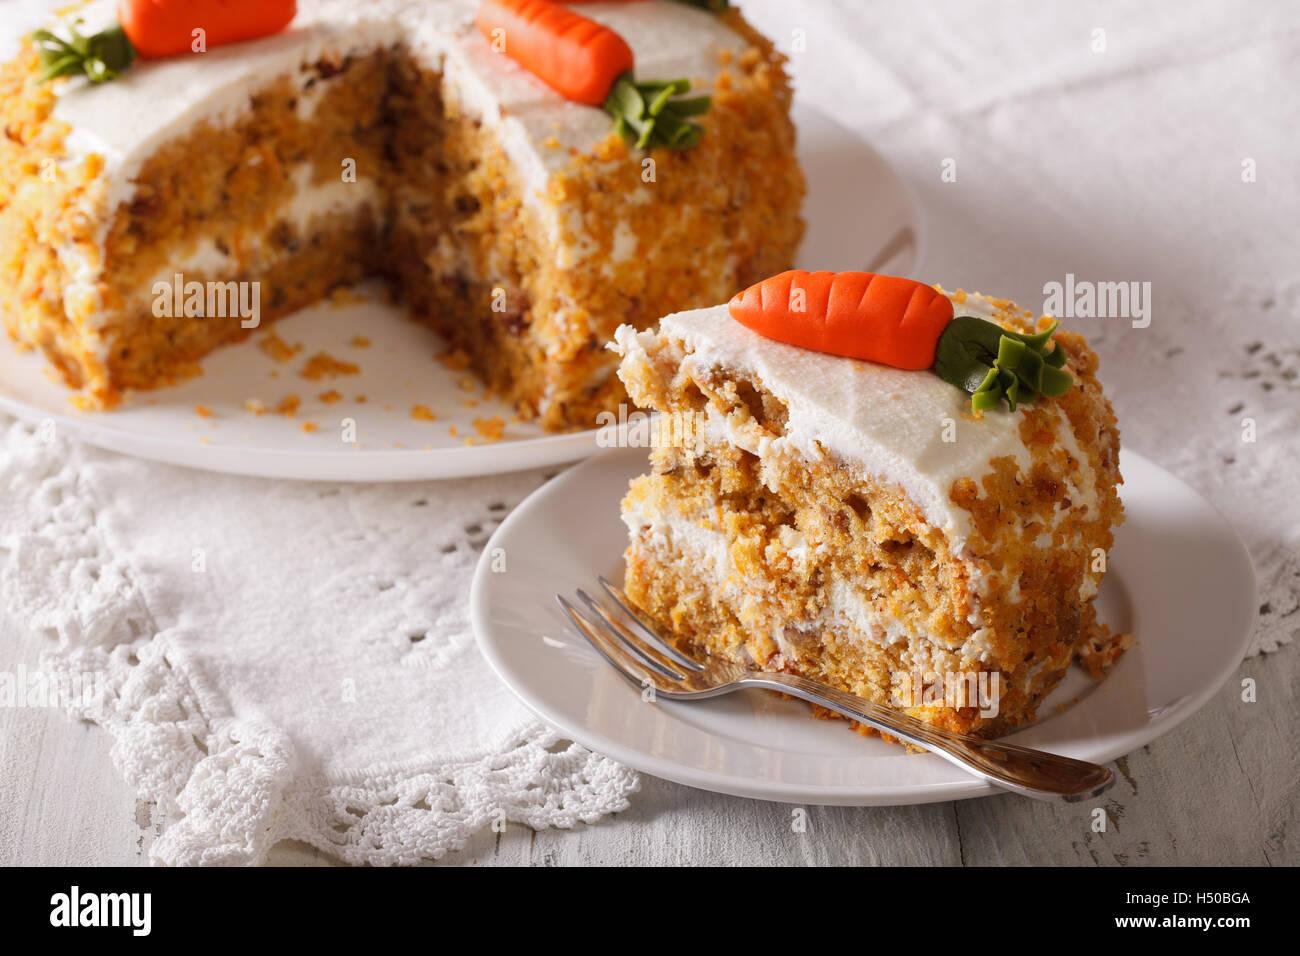 Homemade desserts: sliced carrot cake on a plate closeup. horizontal - Stock Image